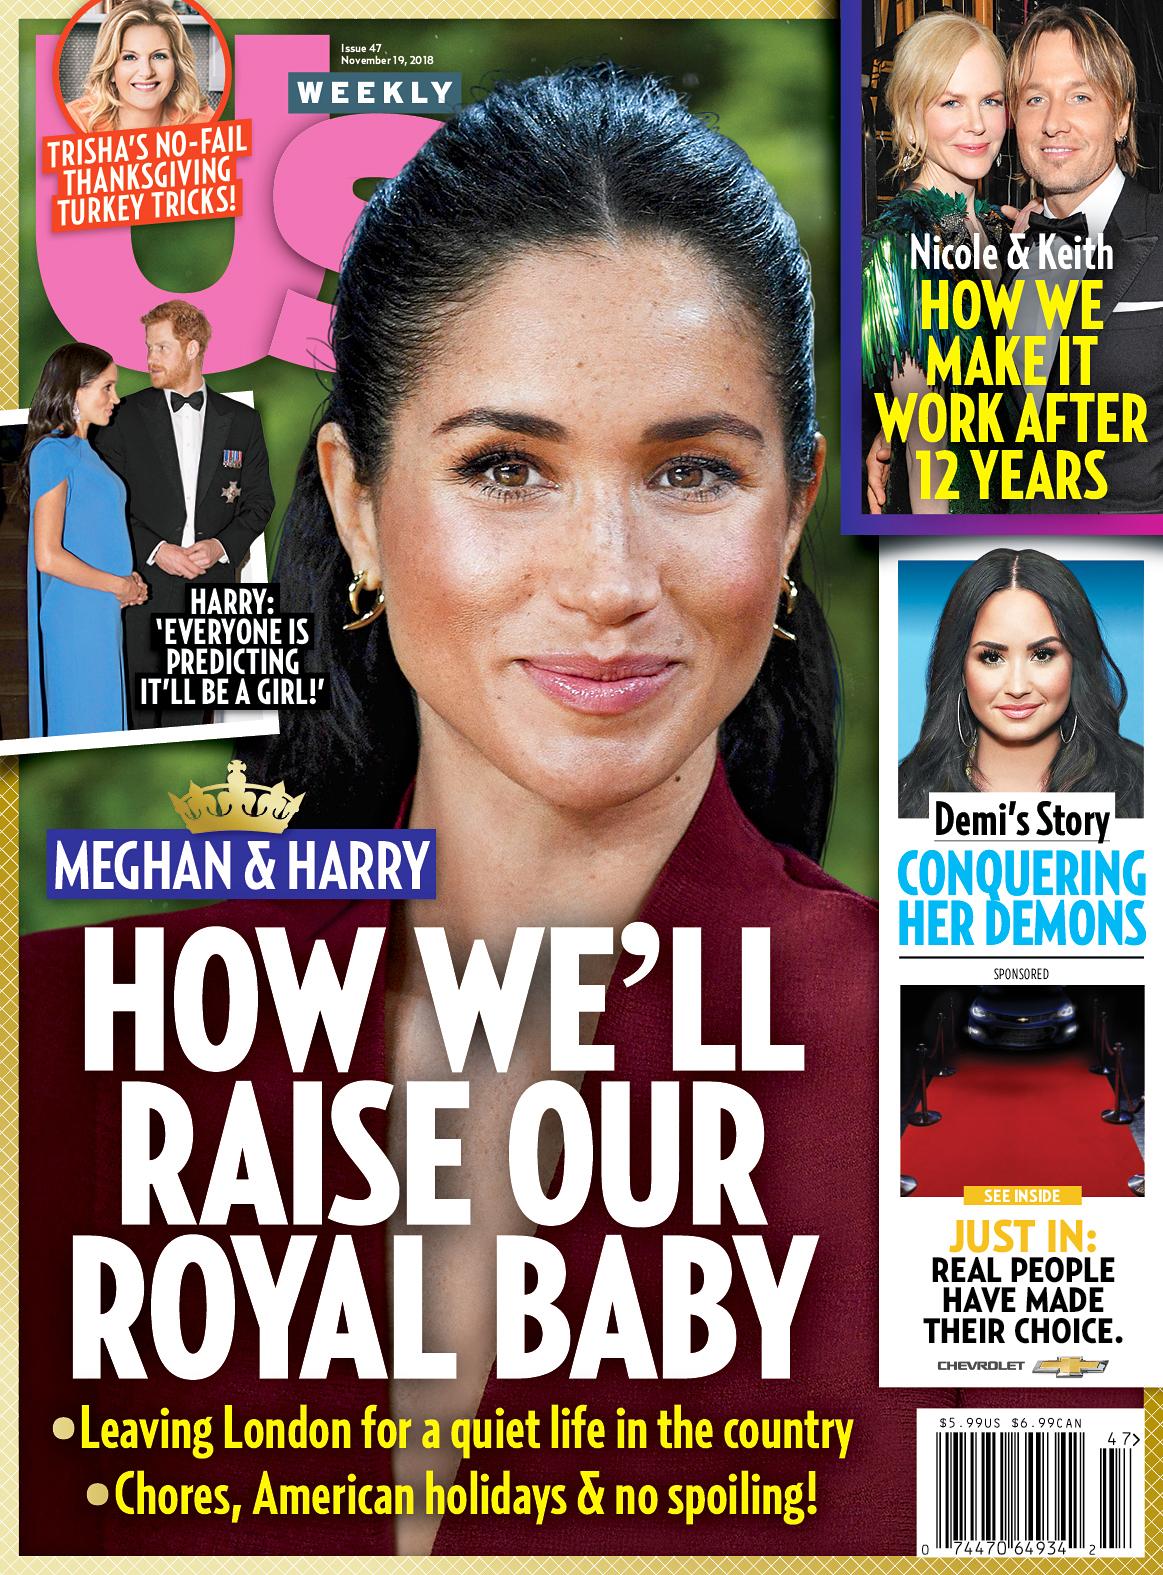 Us Weekly Cover Duchess Meghan - US4718 Us Weekly Cover Duchess Meghan